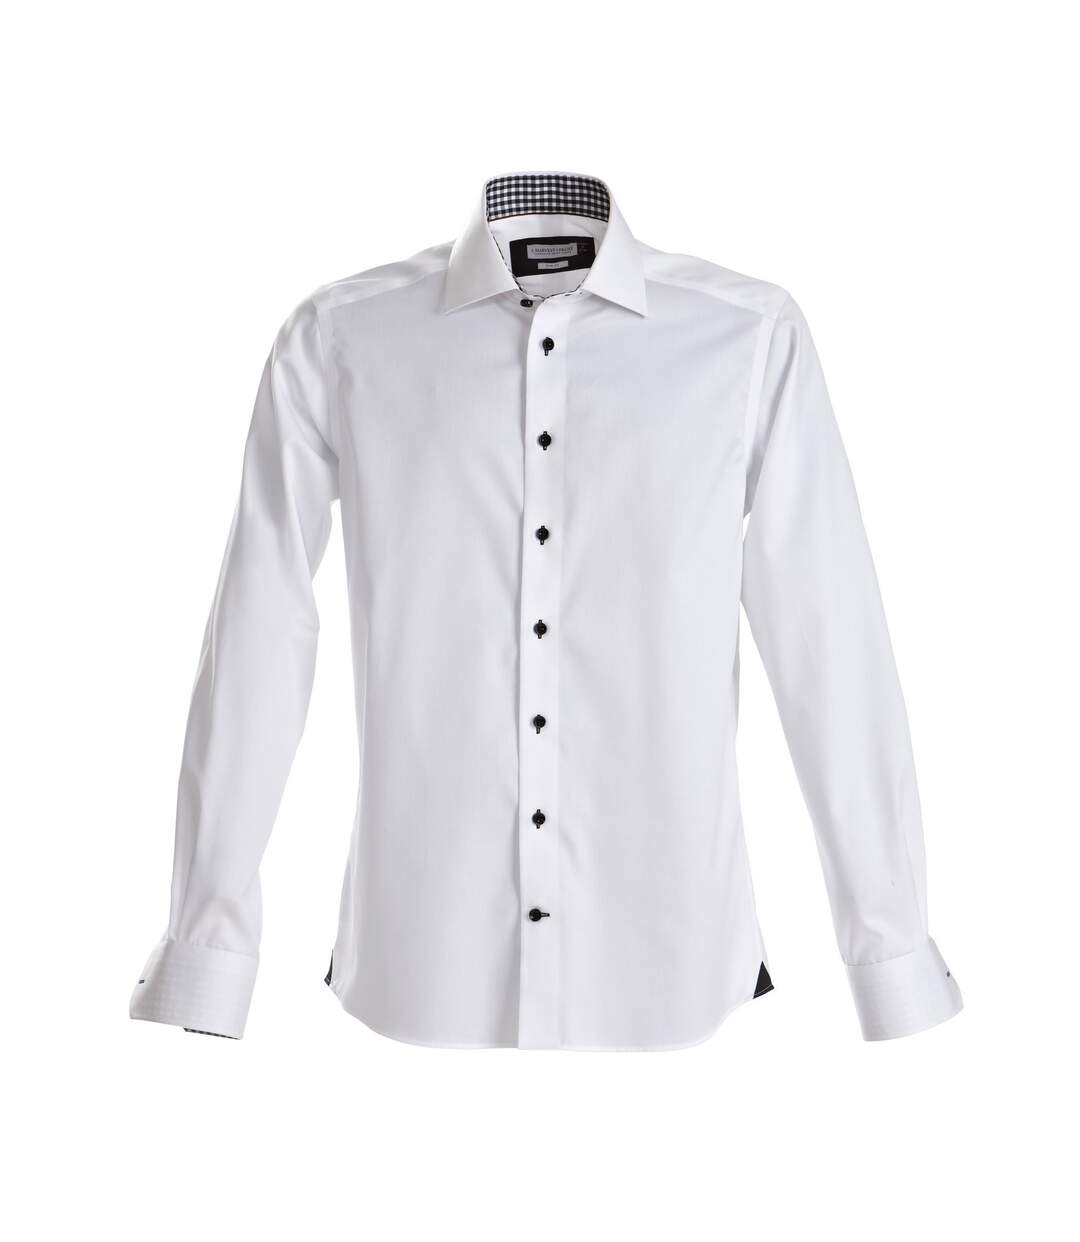 J Harvest & Frost Mens Red Bow Collection Regular Fit Formal Shirt (White/ Navy) - UTRW3871